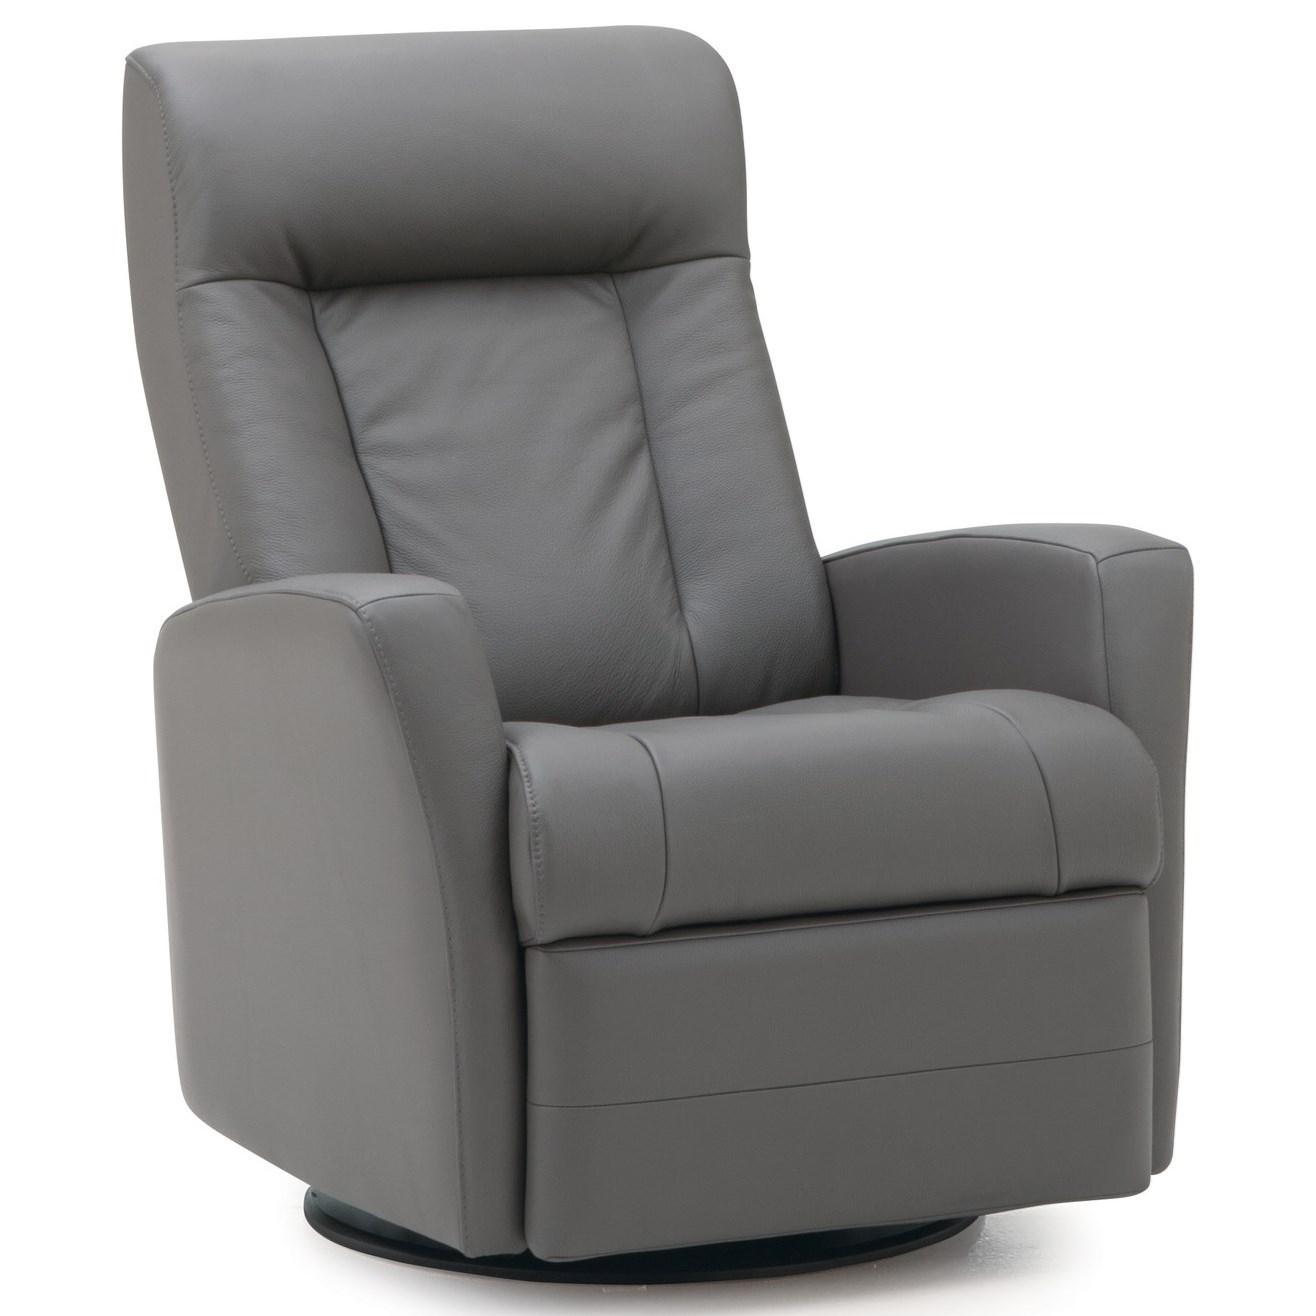 Banff II Swivel Glider Recliner by Palliser at Mueller Furniture